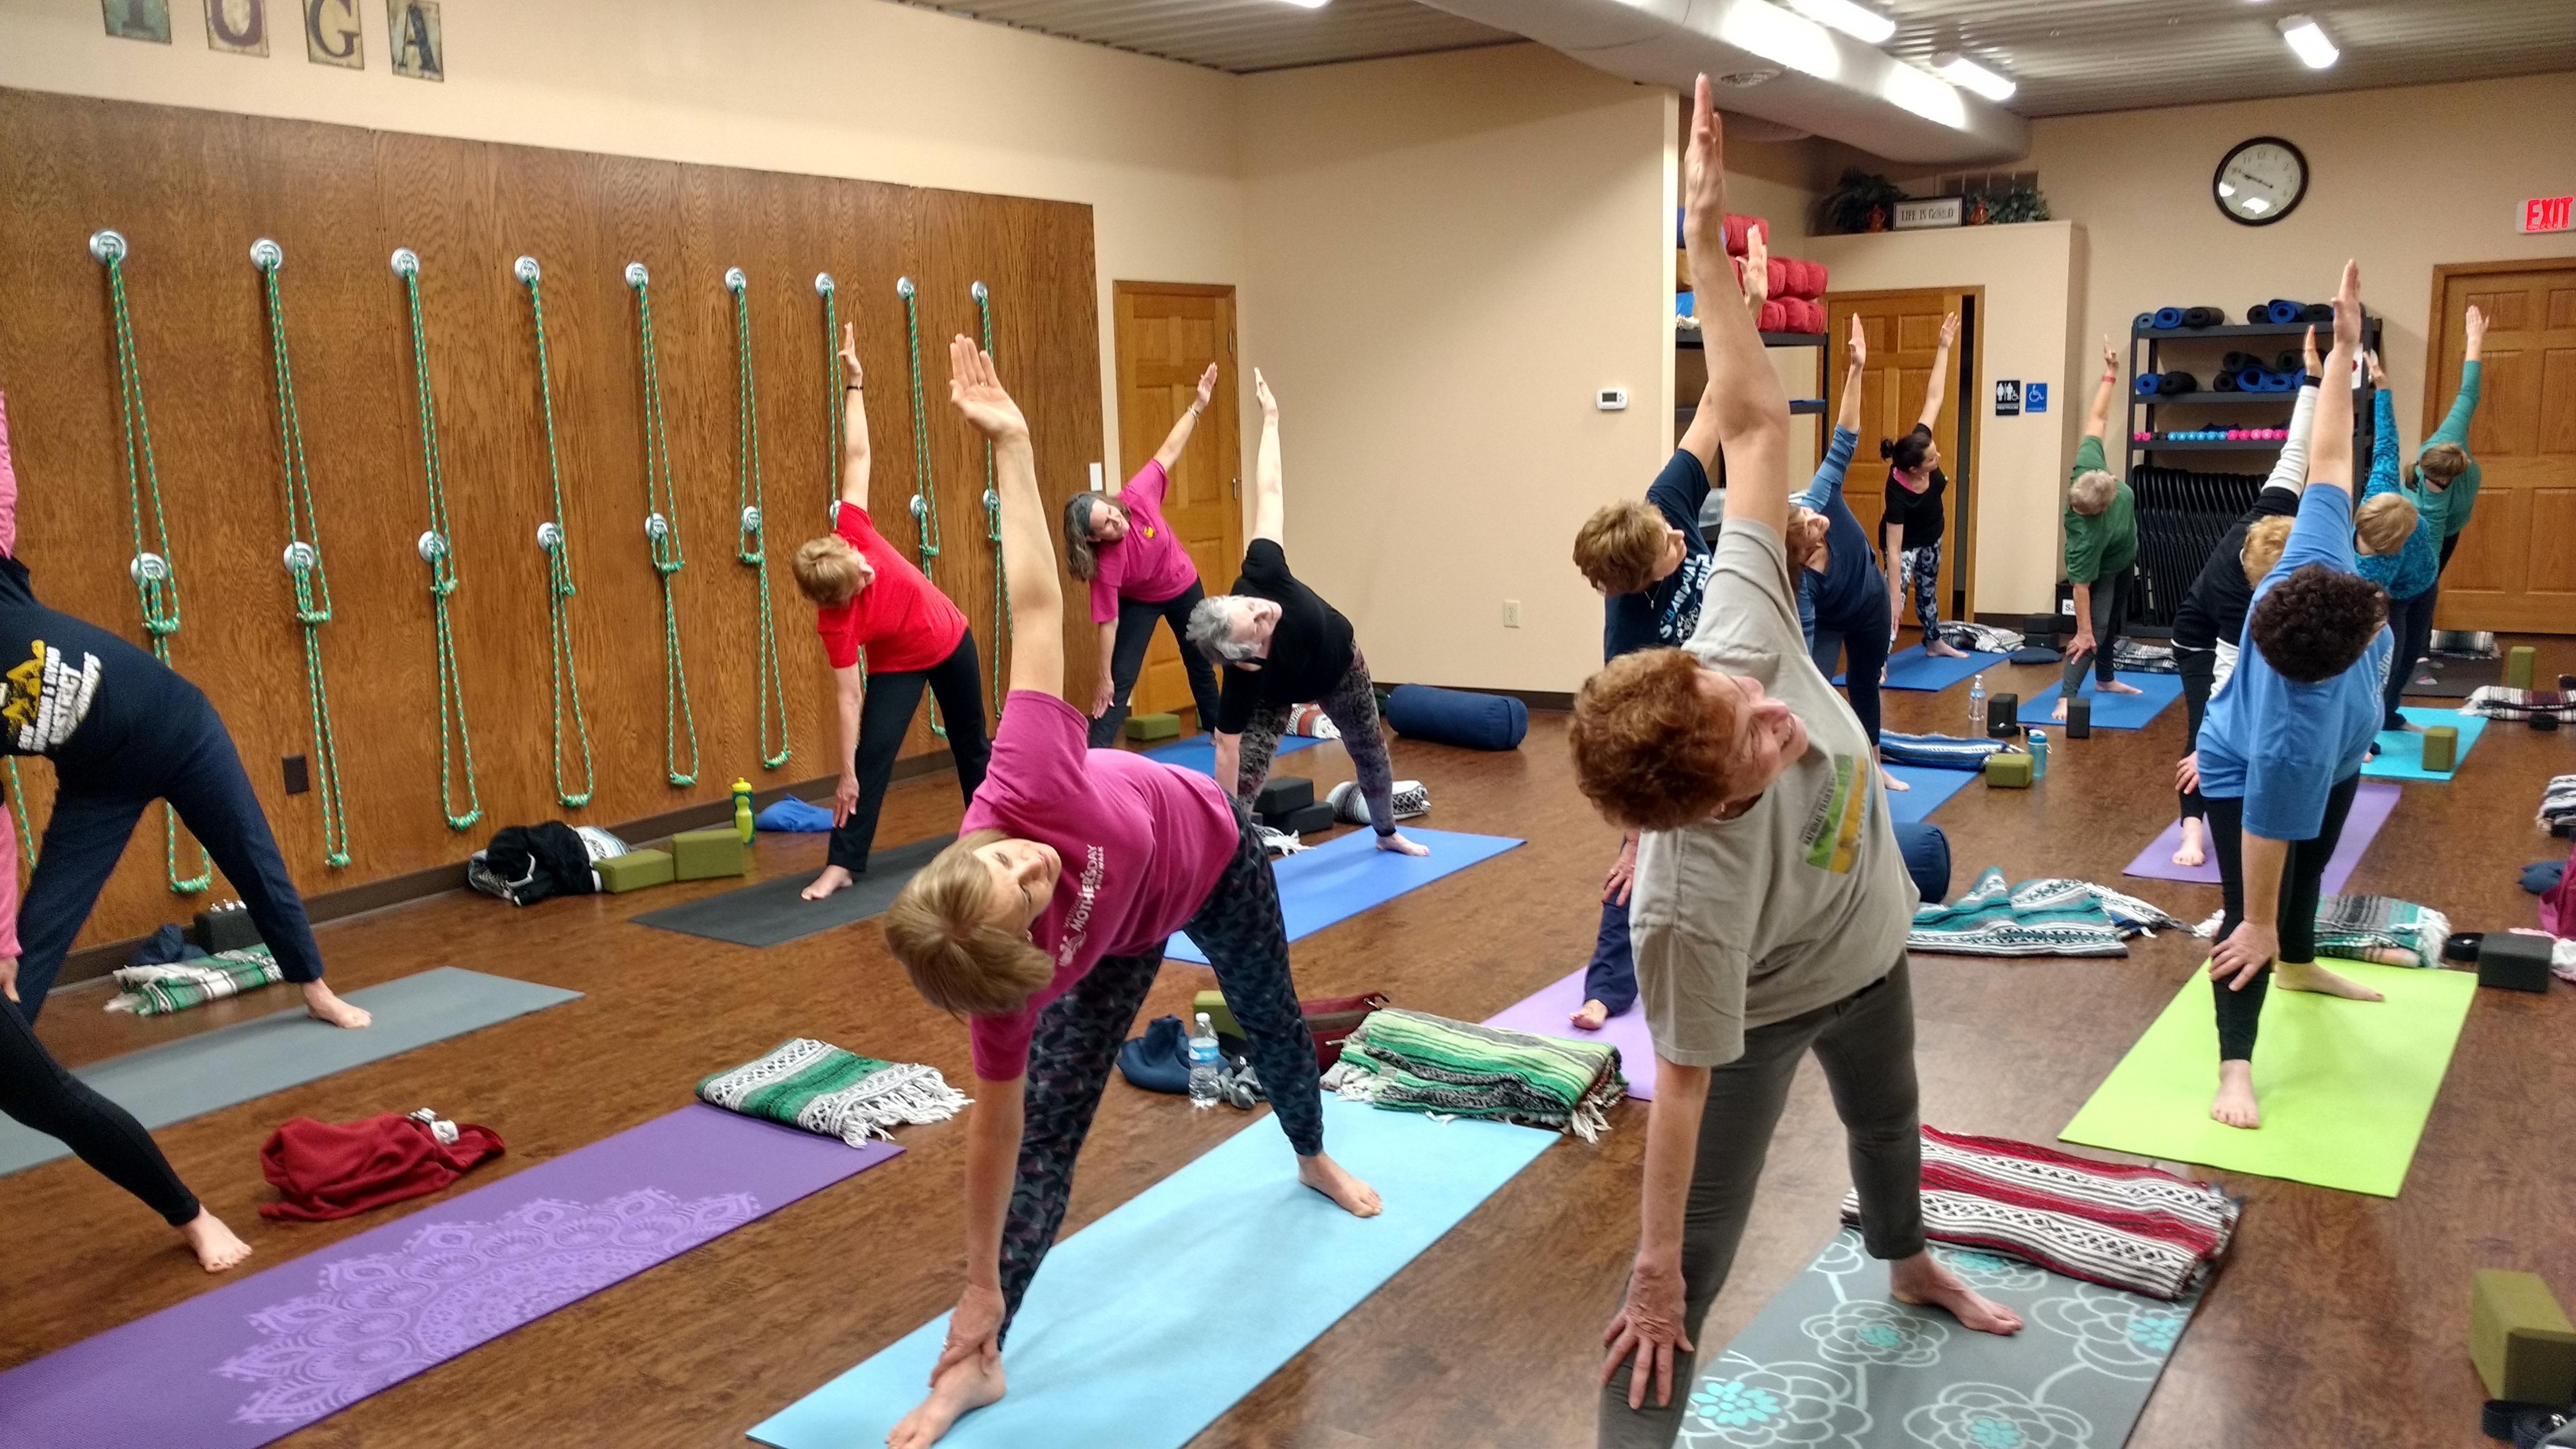 YogaChuck.com - Learning yoga in class.